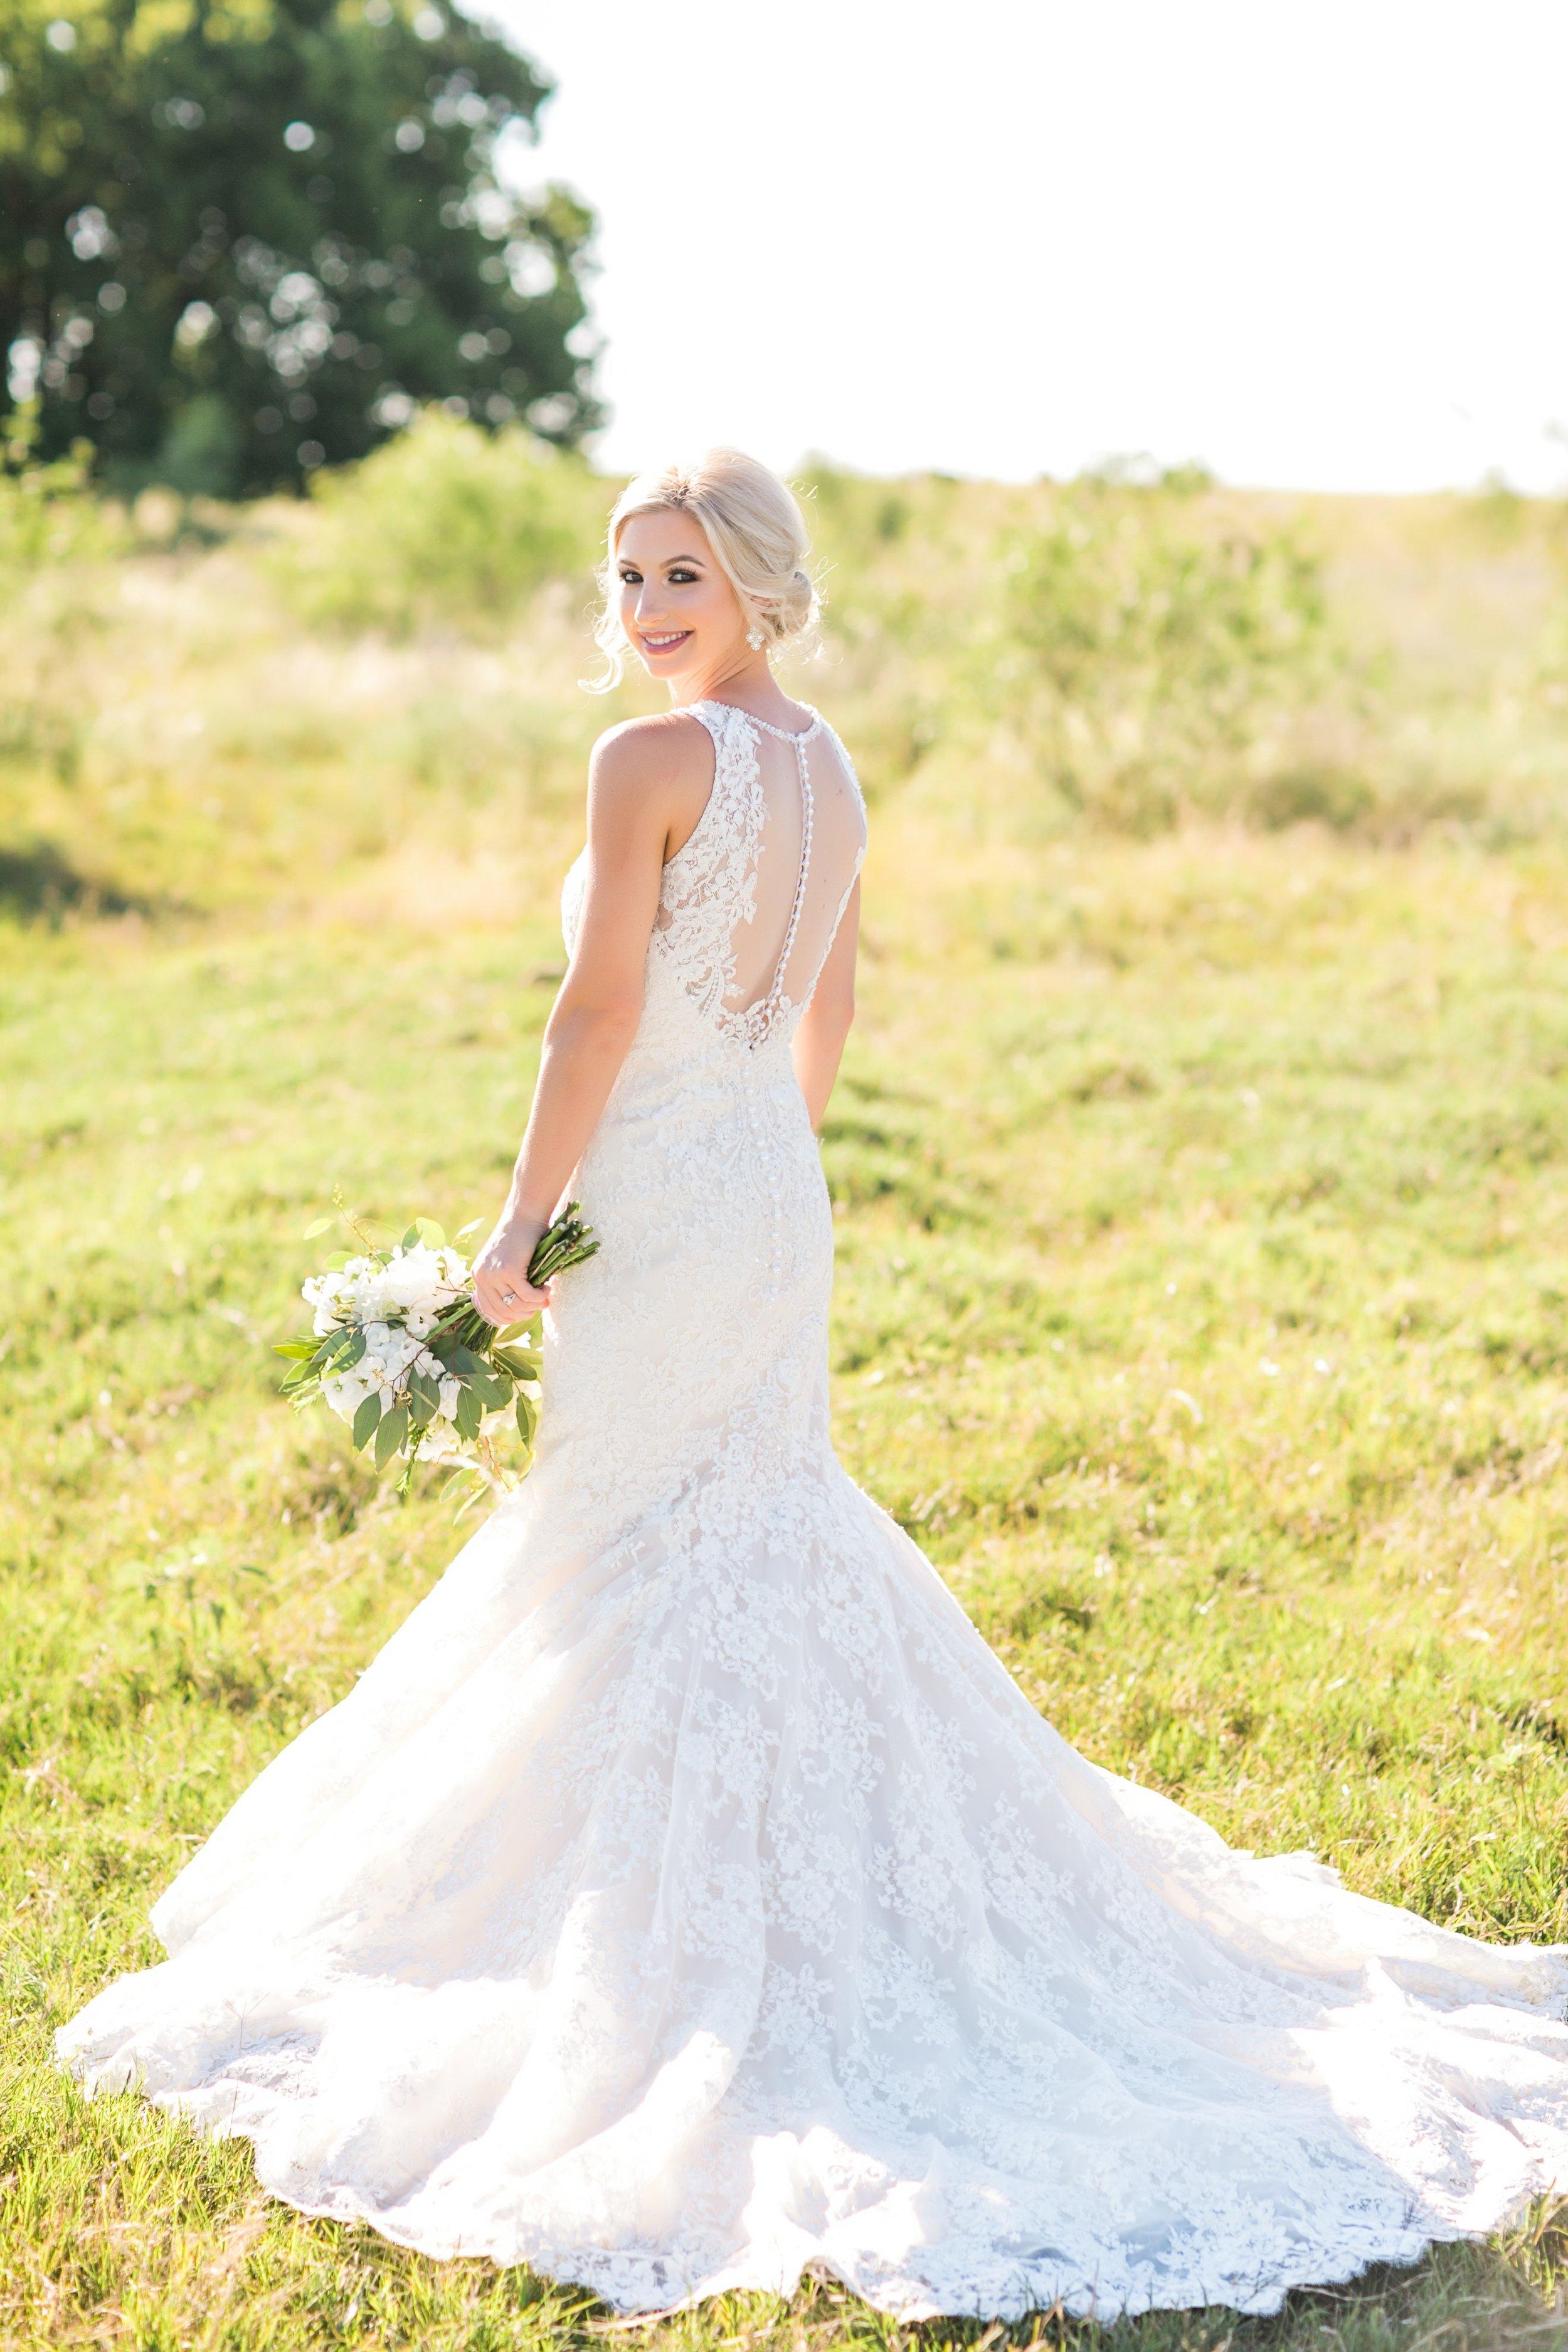 Lexi-bridals-019.JPG